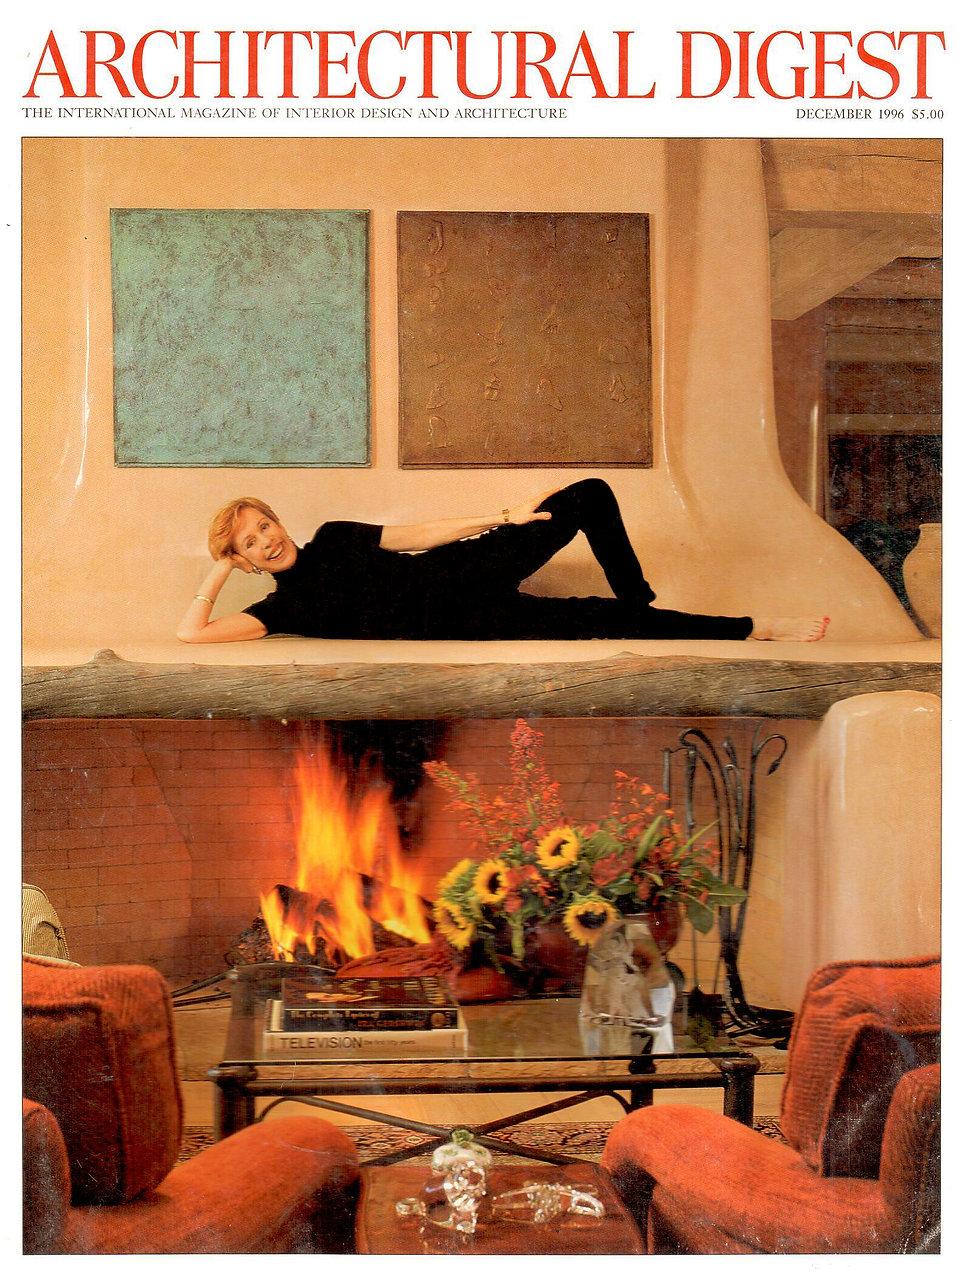 AD Carol Burnett2.jpg